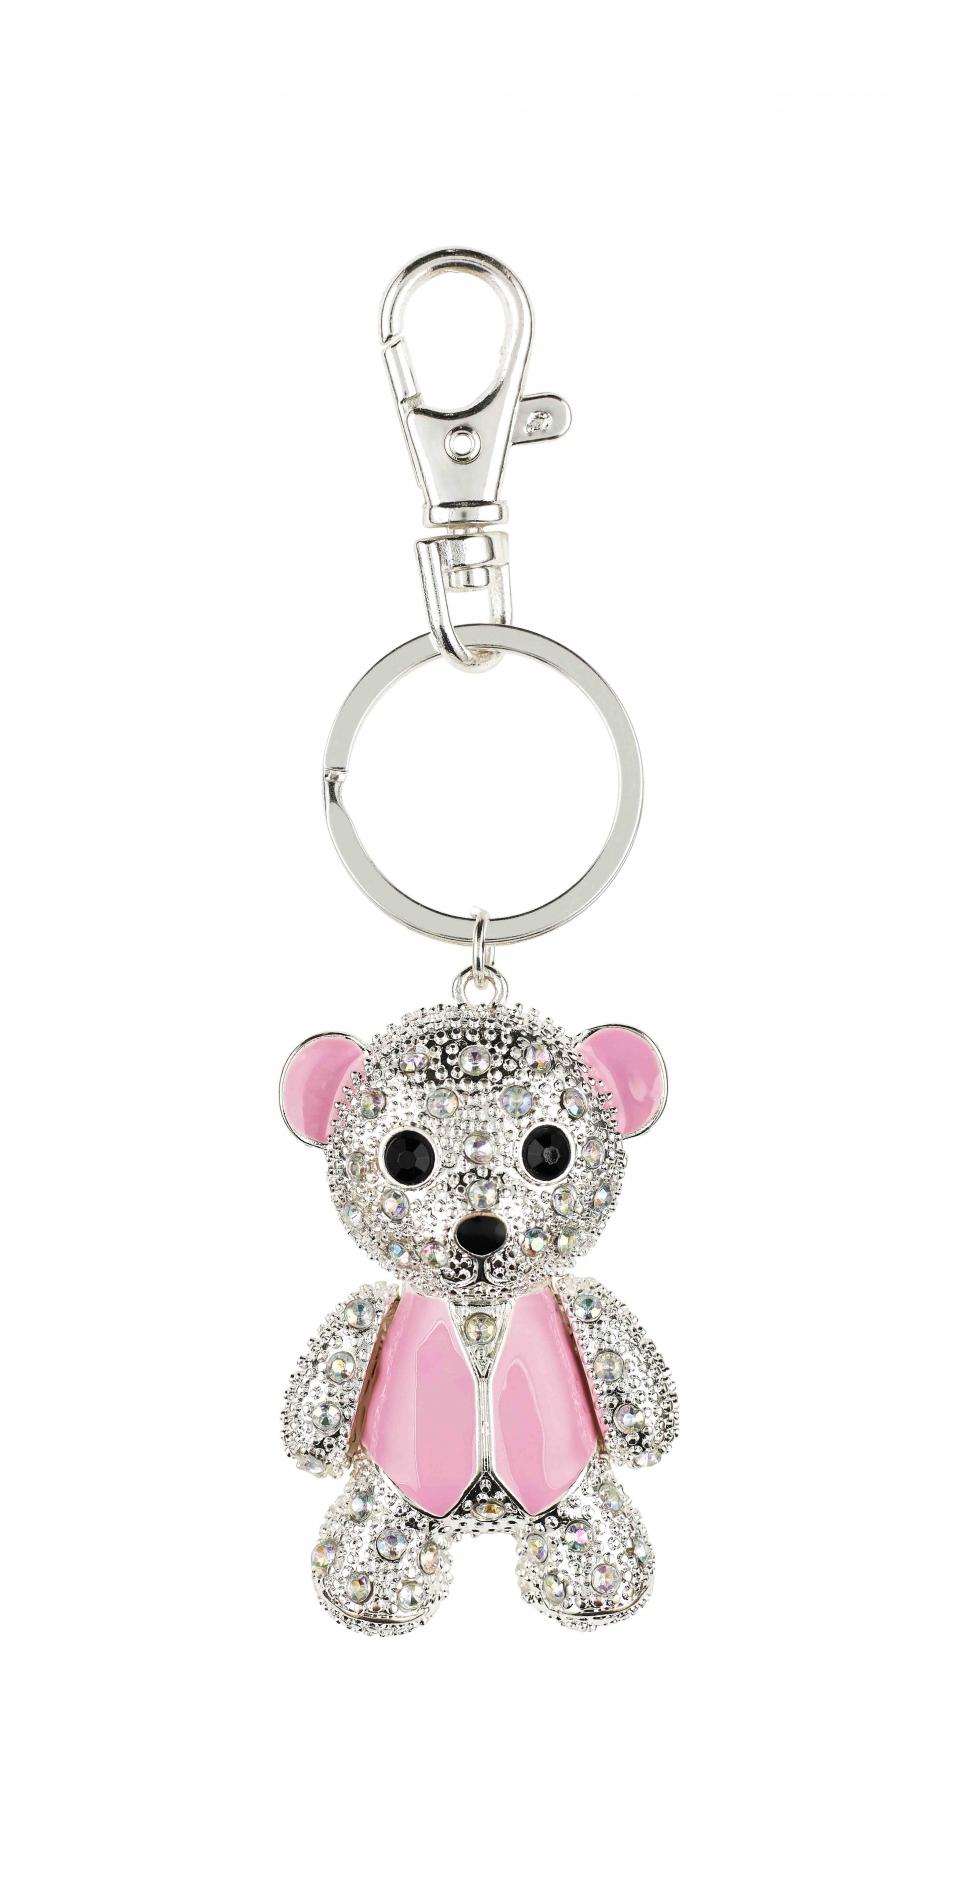 White apron asda - Asda Tickled Pink Teddy Keyring